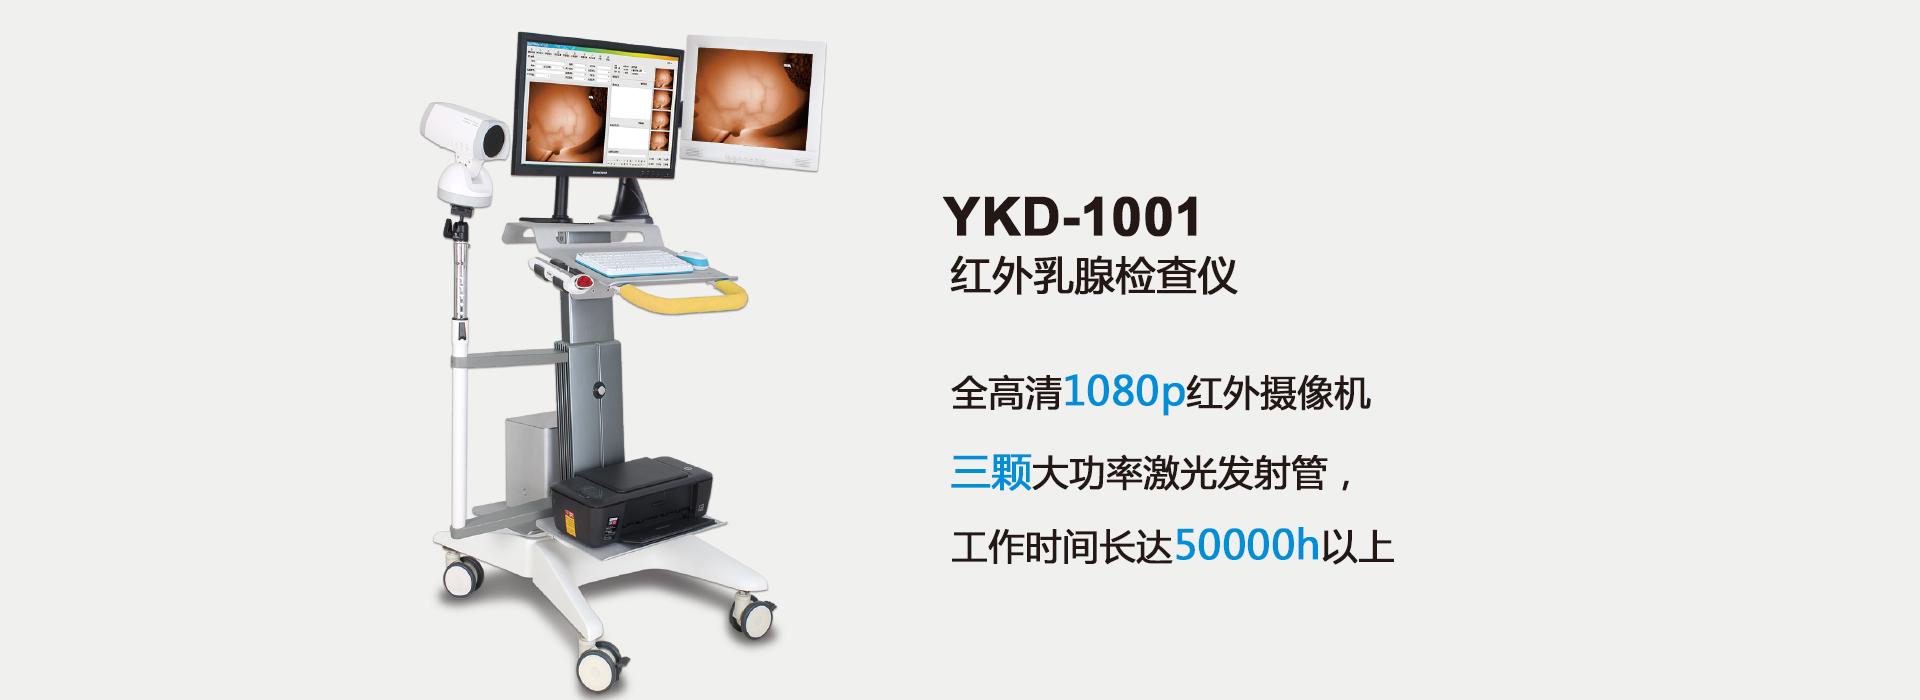 YKD-1001 红外乳腺检查仪